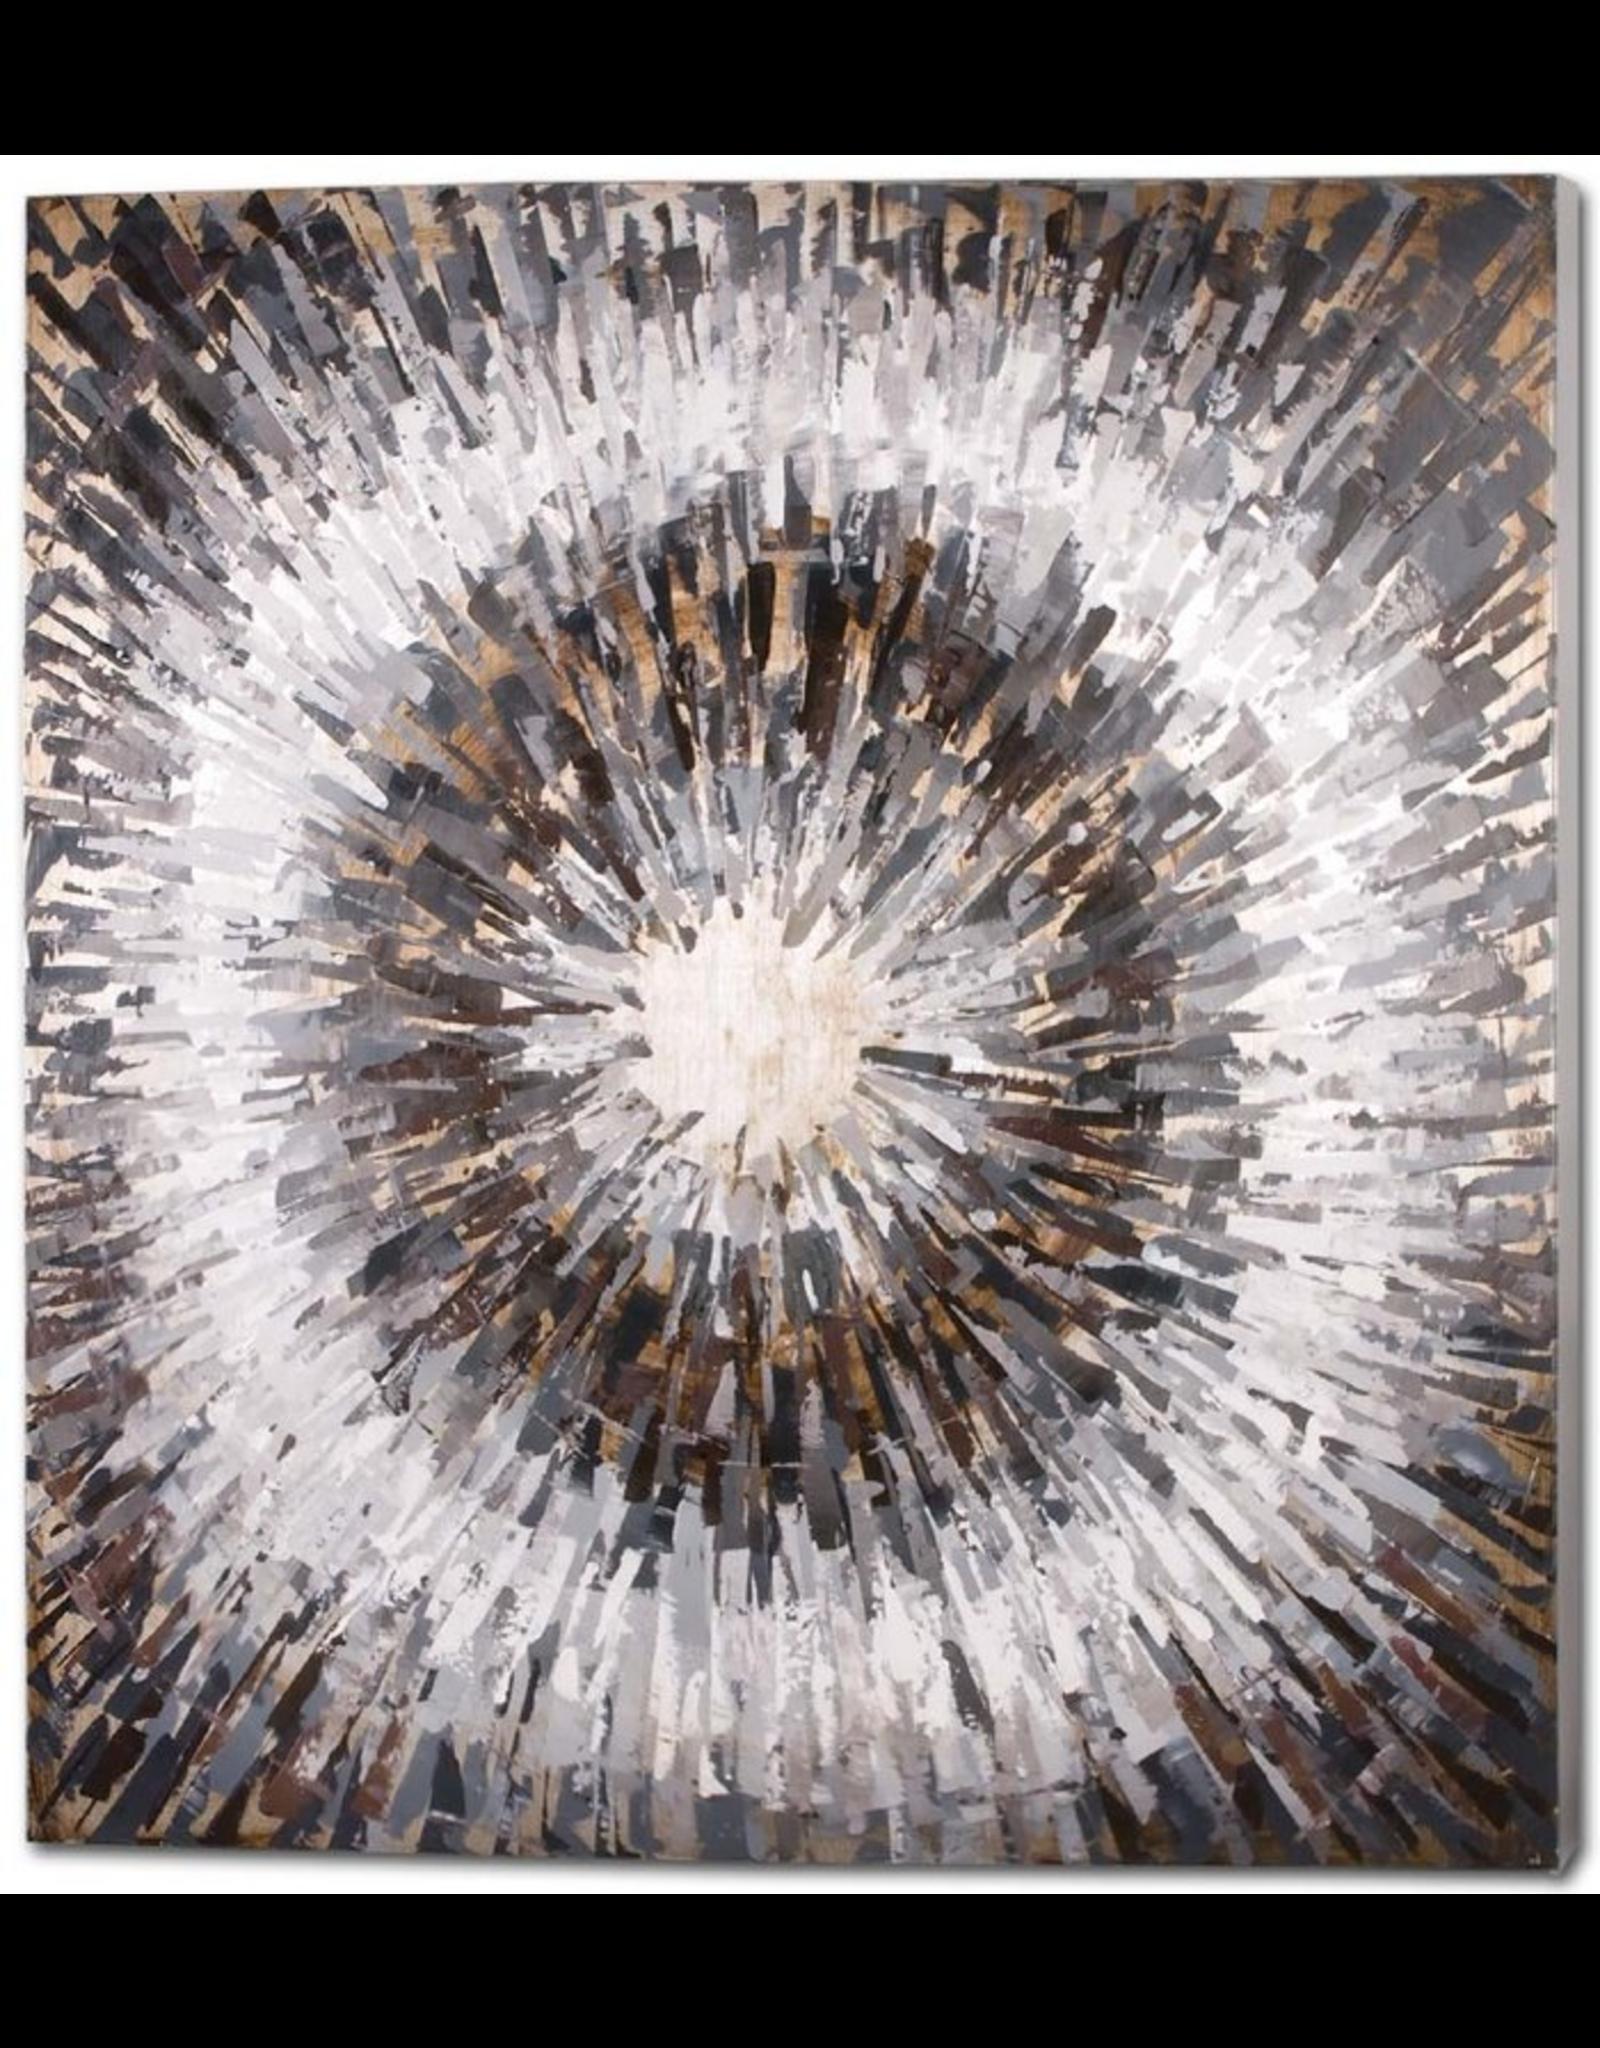 Mercana Abstract Painting Deja vu LG Square Wall Art 47x47